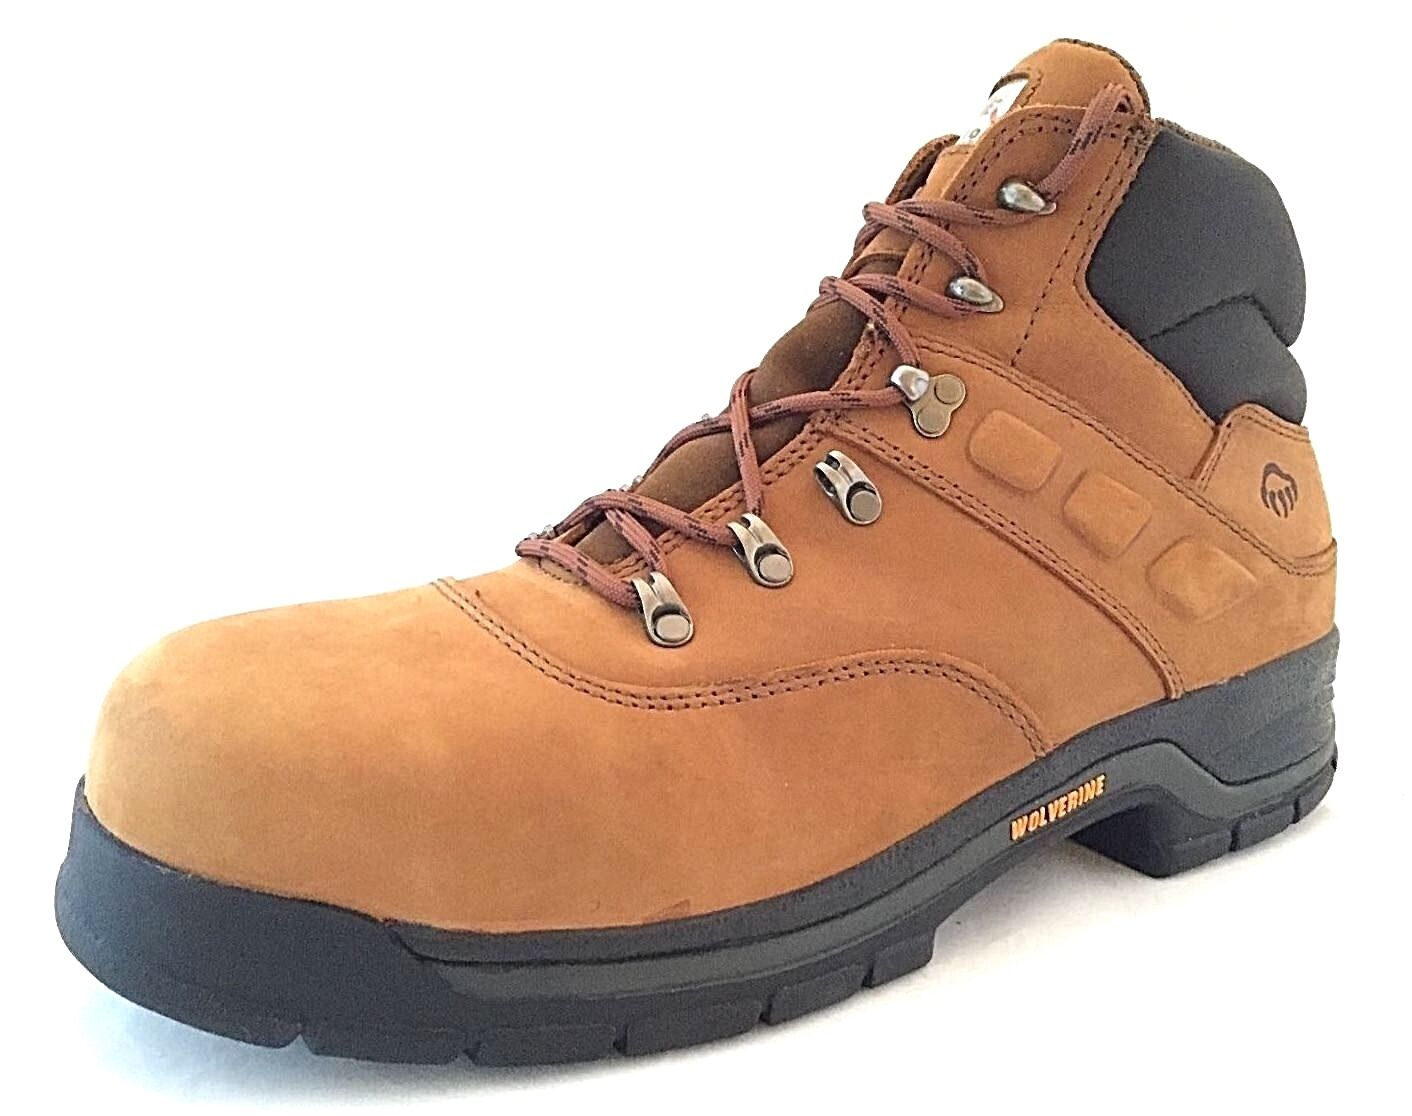 6cfa71a7b31 UPC 018466471579 - Wolverine Men's Cirrus Safety Toe Hiker Boot ...